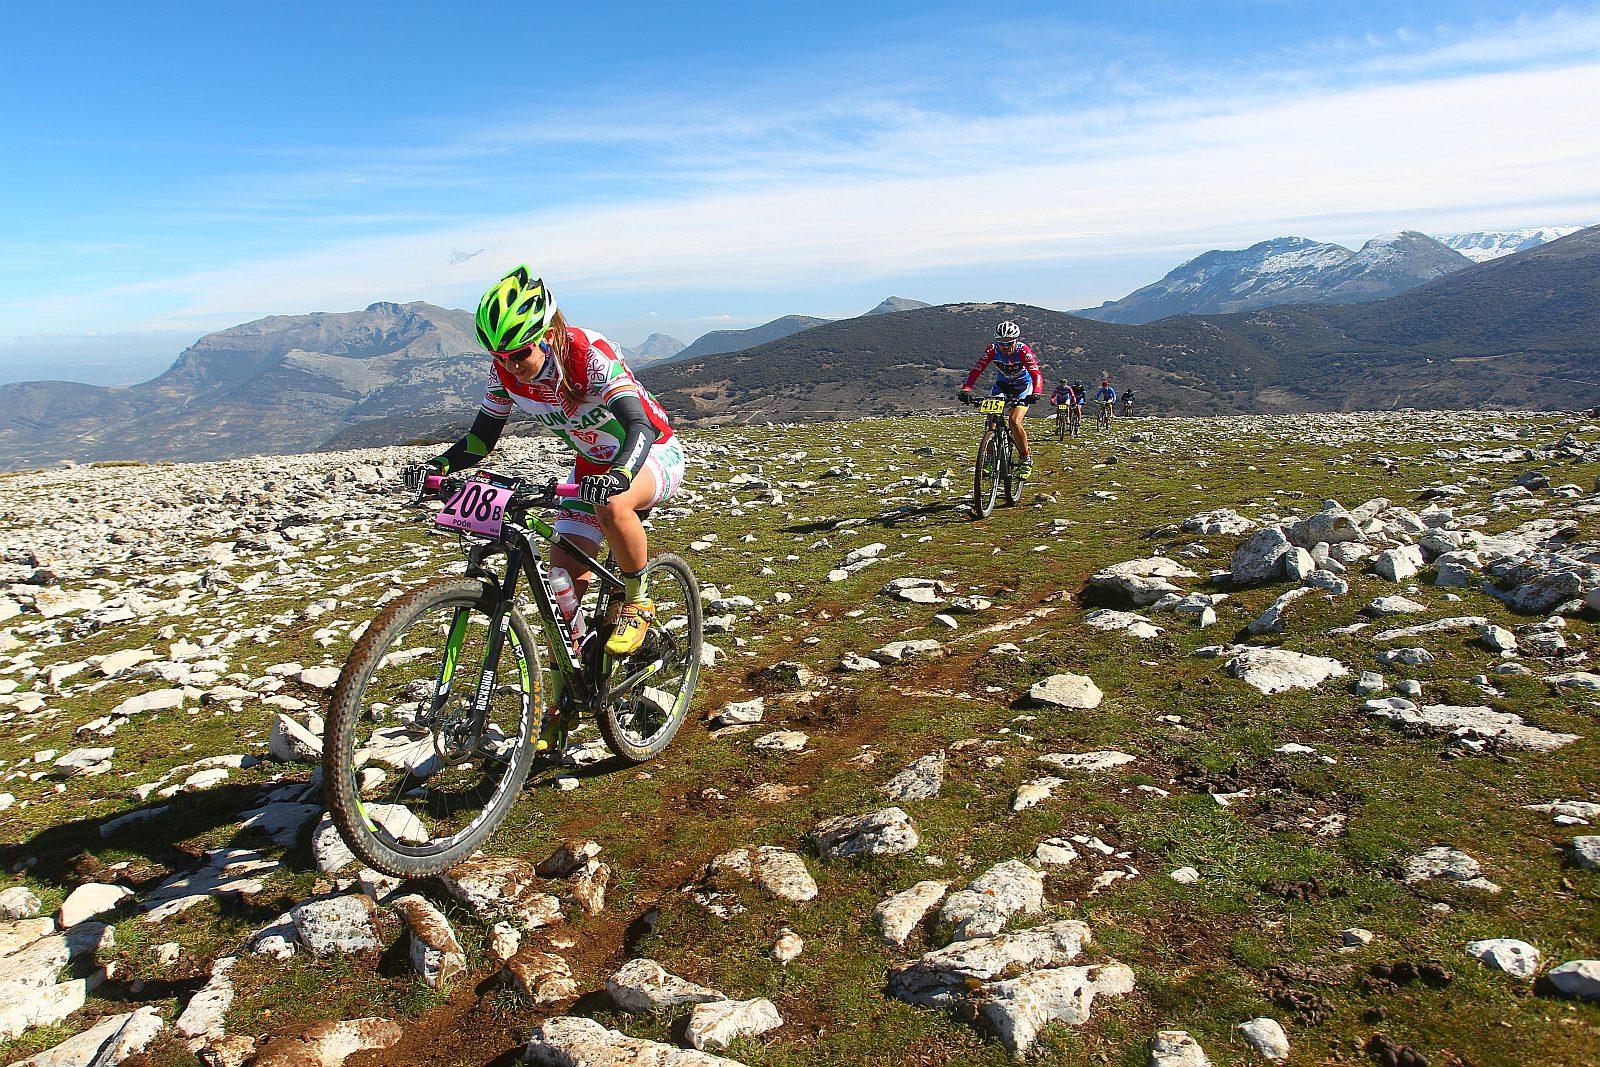 andalucia_bike_race_poor_brigitta_04